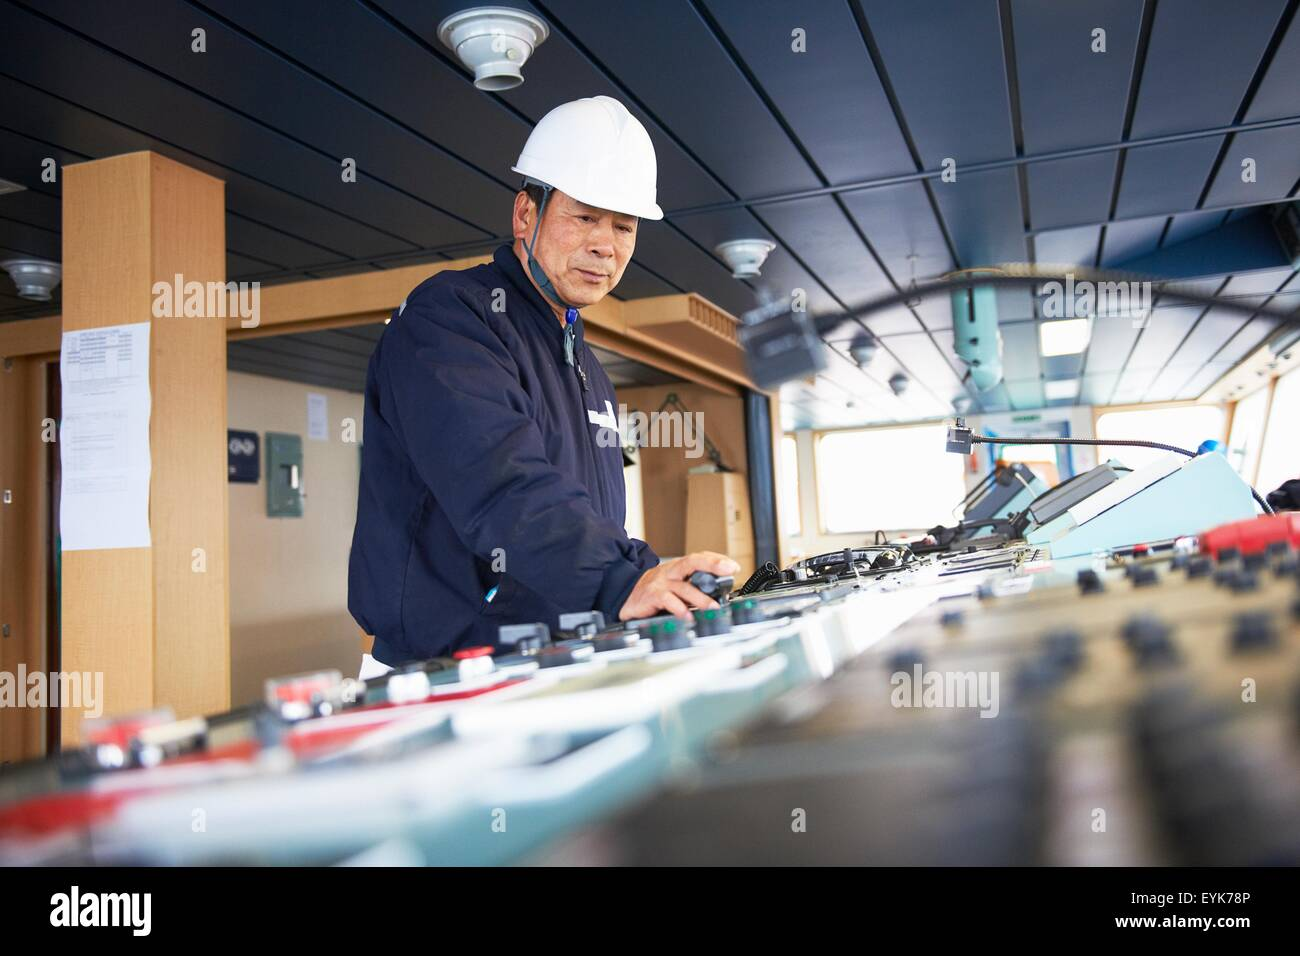 Worker using equipment at shipping port, GoSeong-gun, South Korea - Stock Image